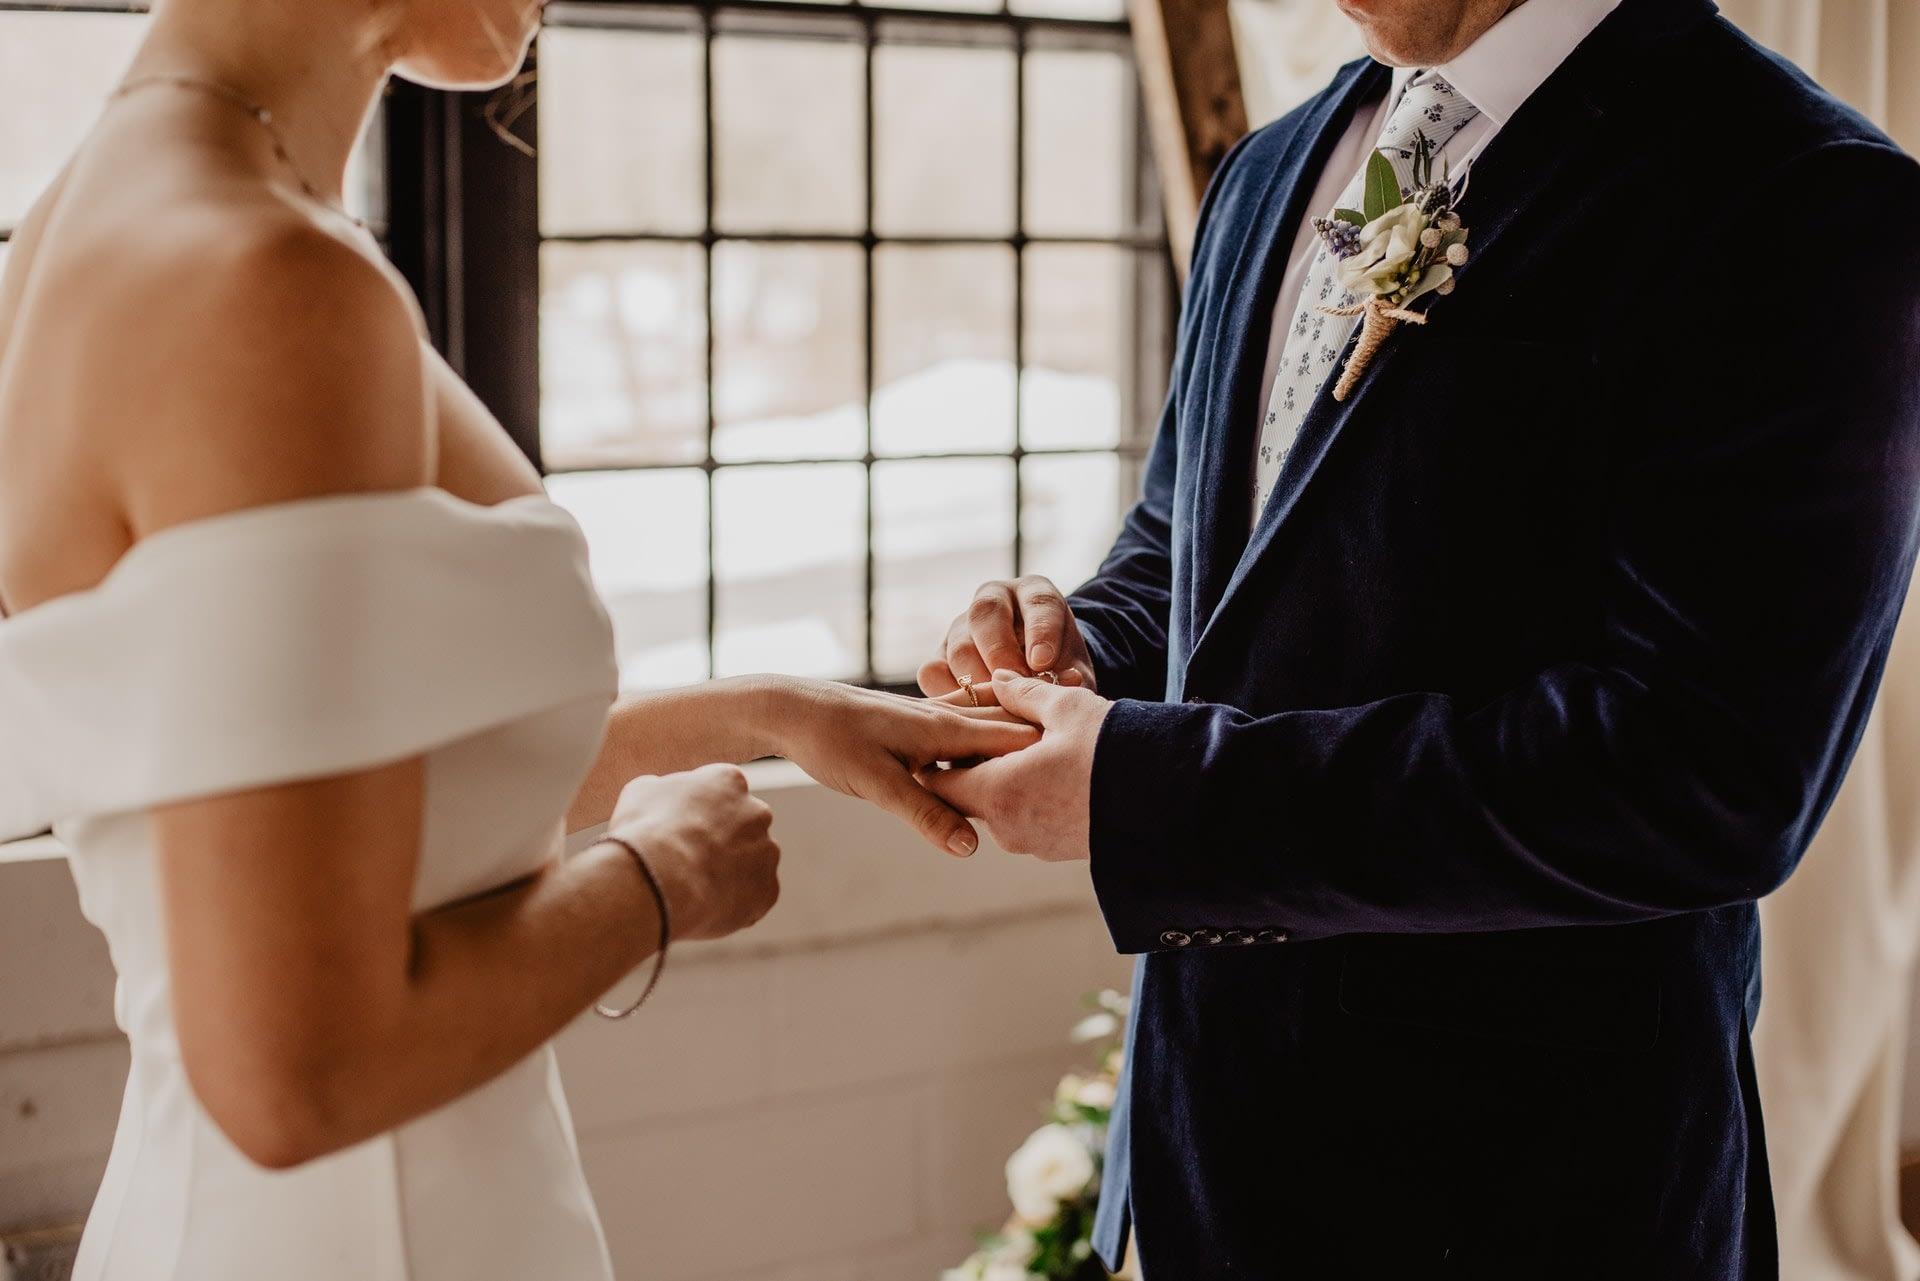 affection-bride-bride-and-groom-2253842